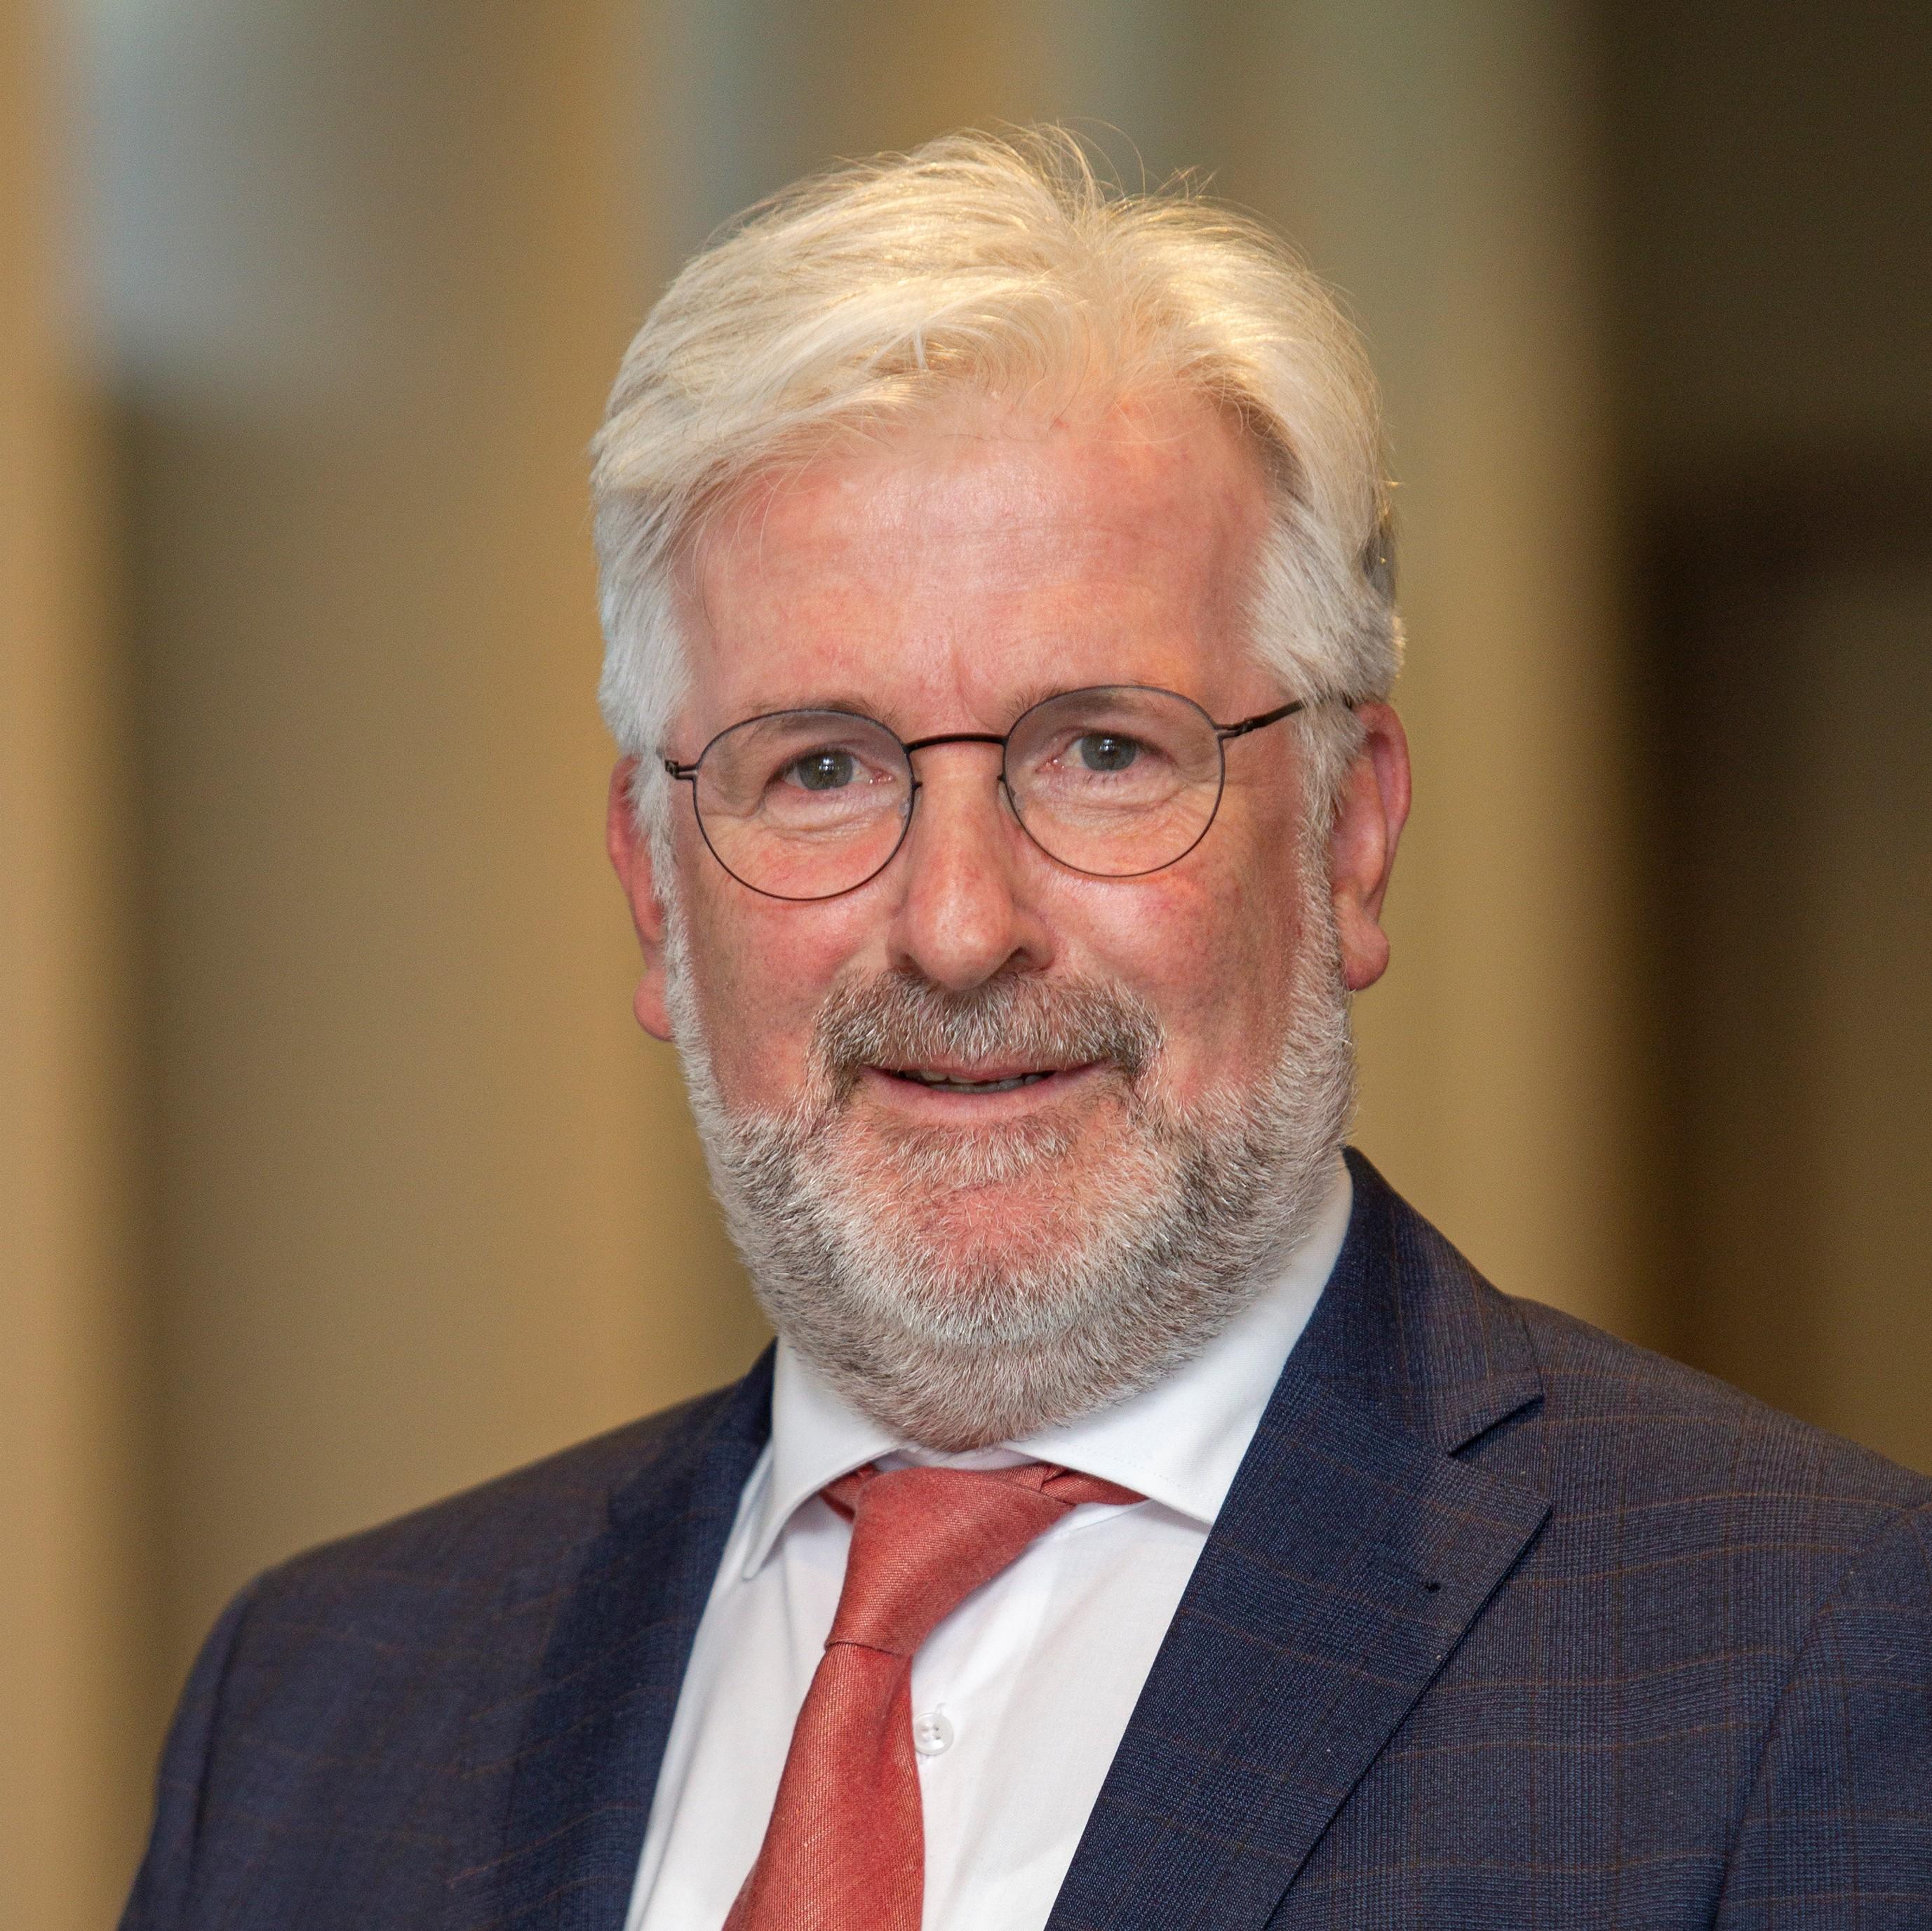 Burgemeester Merrienboer - Zeeland - tbv website VB